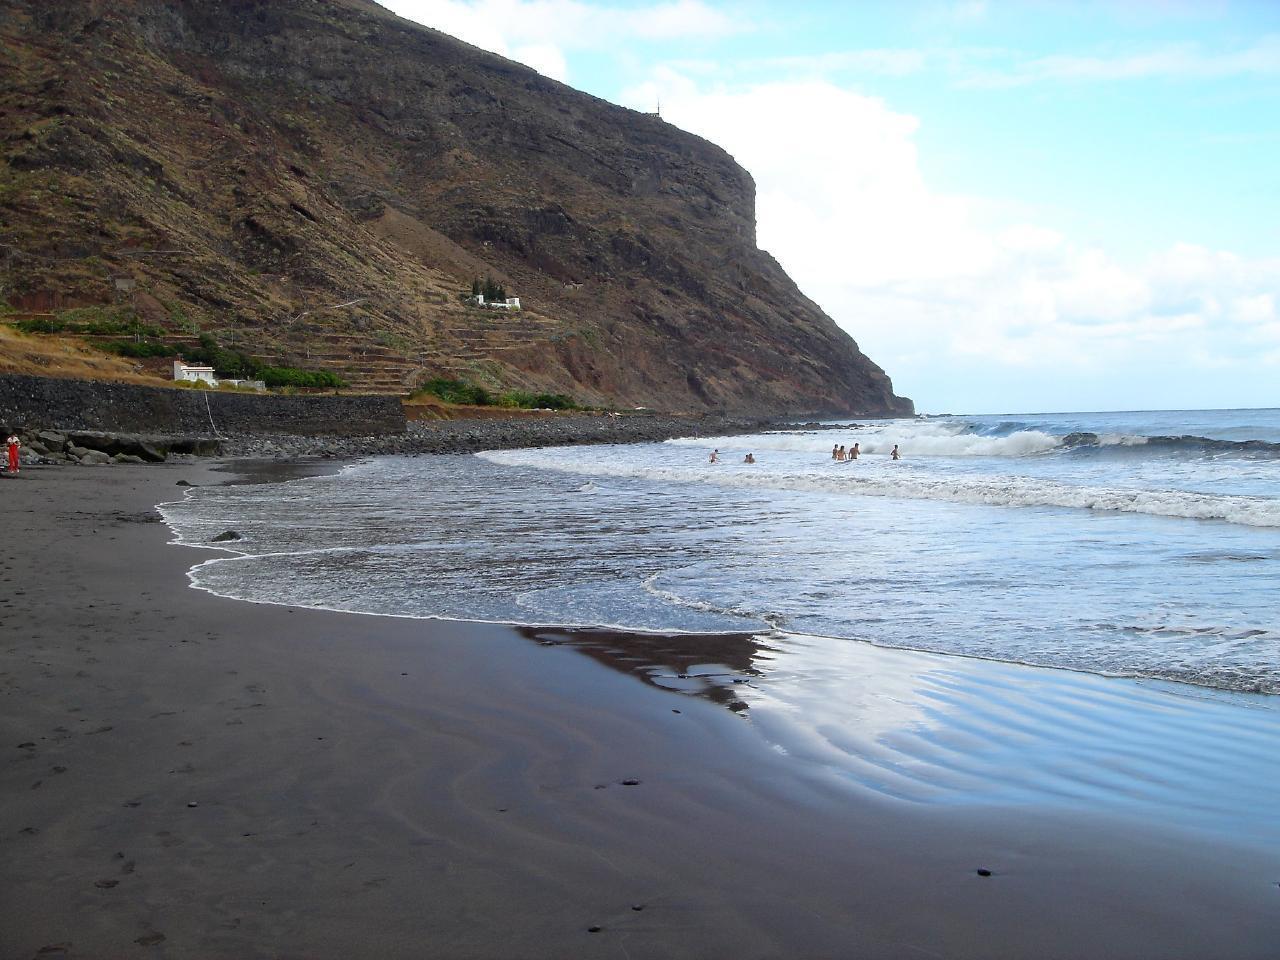 Maison de vacances GUACIMARA - Spektakuläre Aussicht, beheizter Pool, Sauna, Naturstran, relax... (2409670), Igueste Puertecito, Ténérife, Iles Canaries, Espagne, image 32